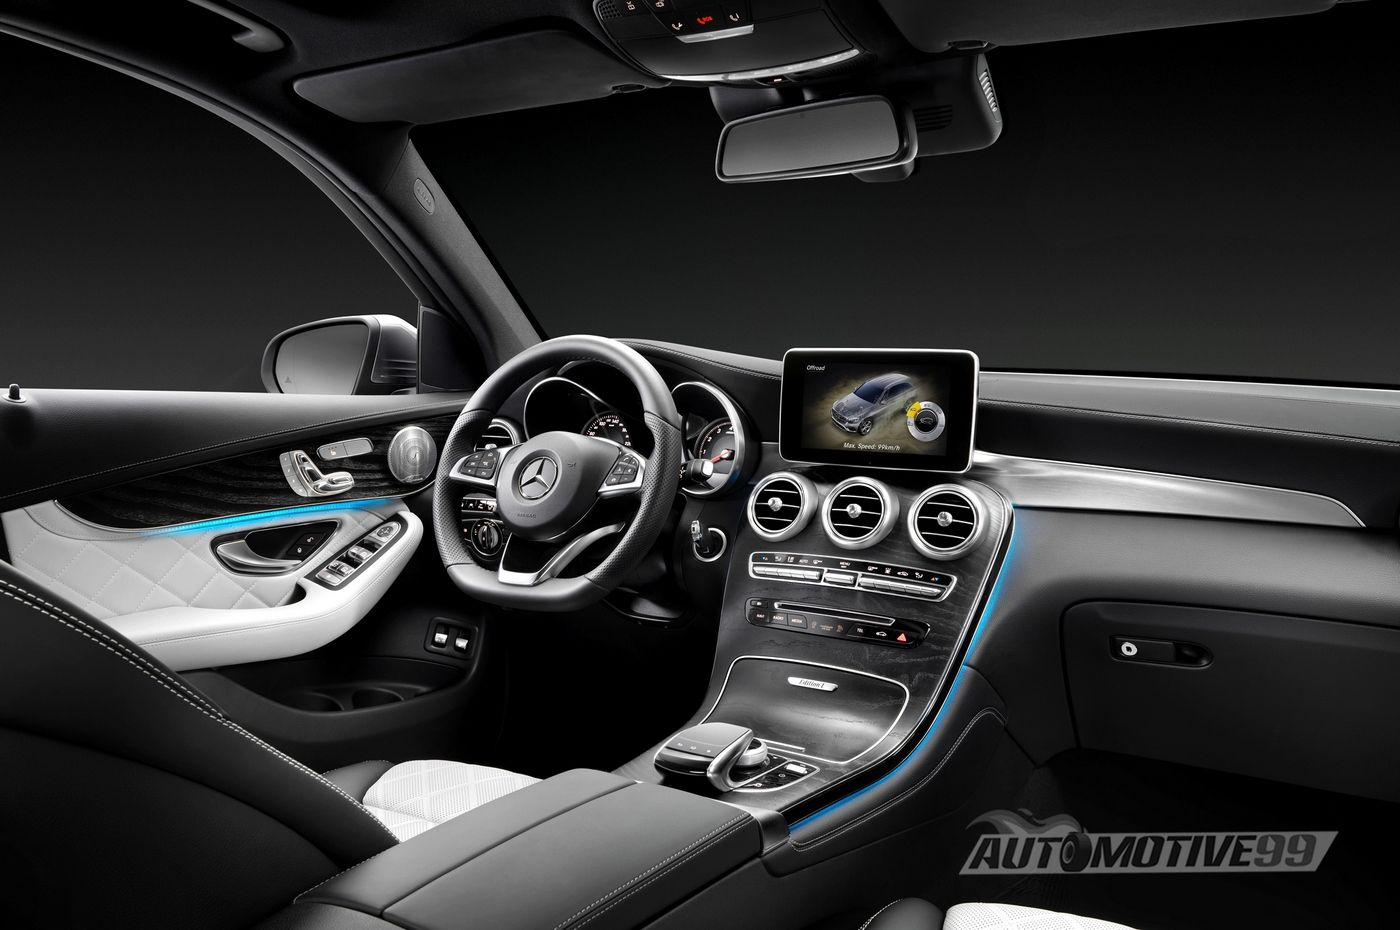 2016 Mercedes Benz Glc Mercedes Benz Suv Mercedes Benz